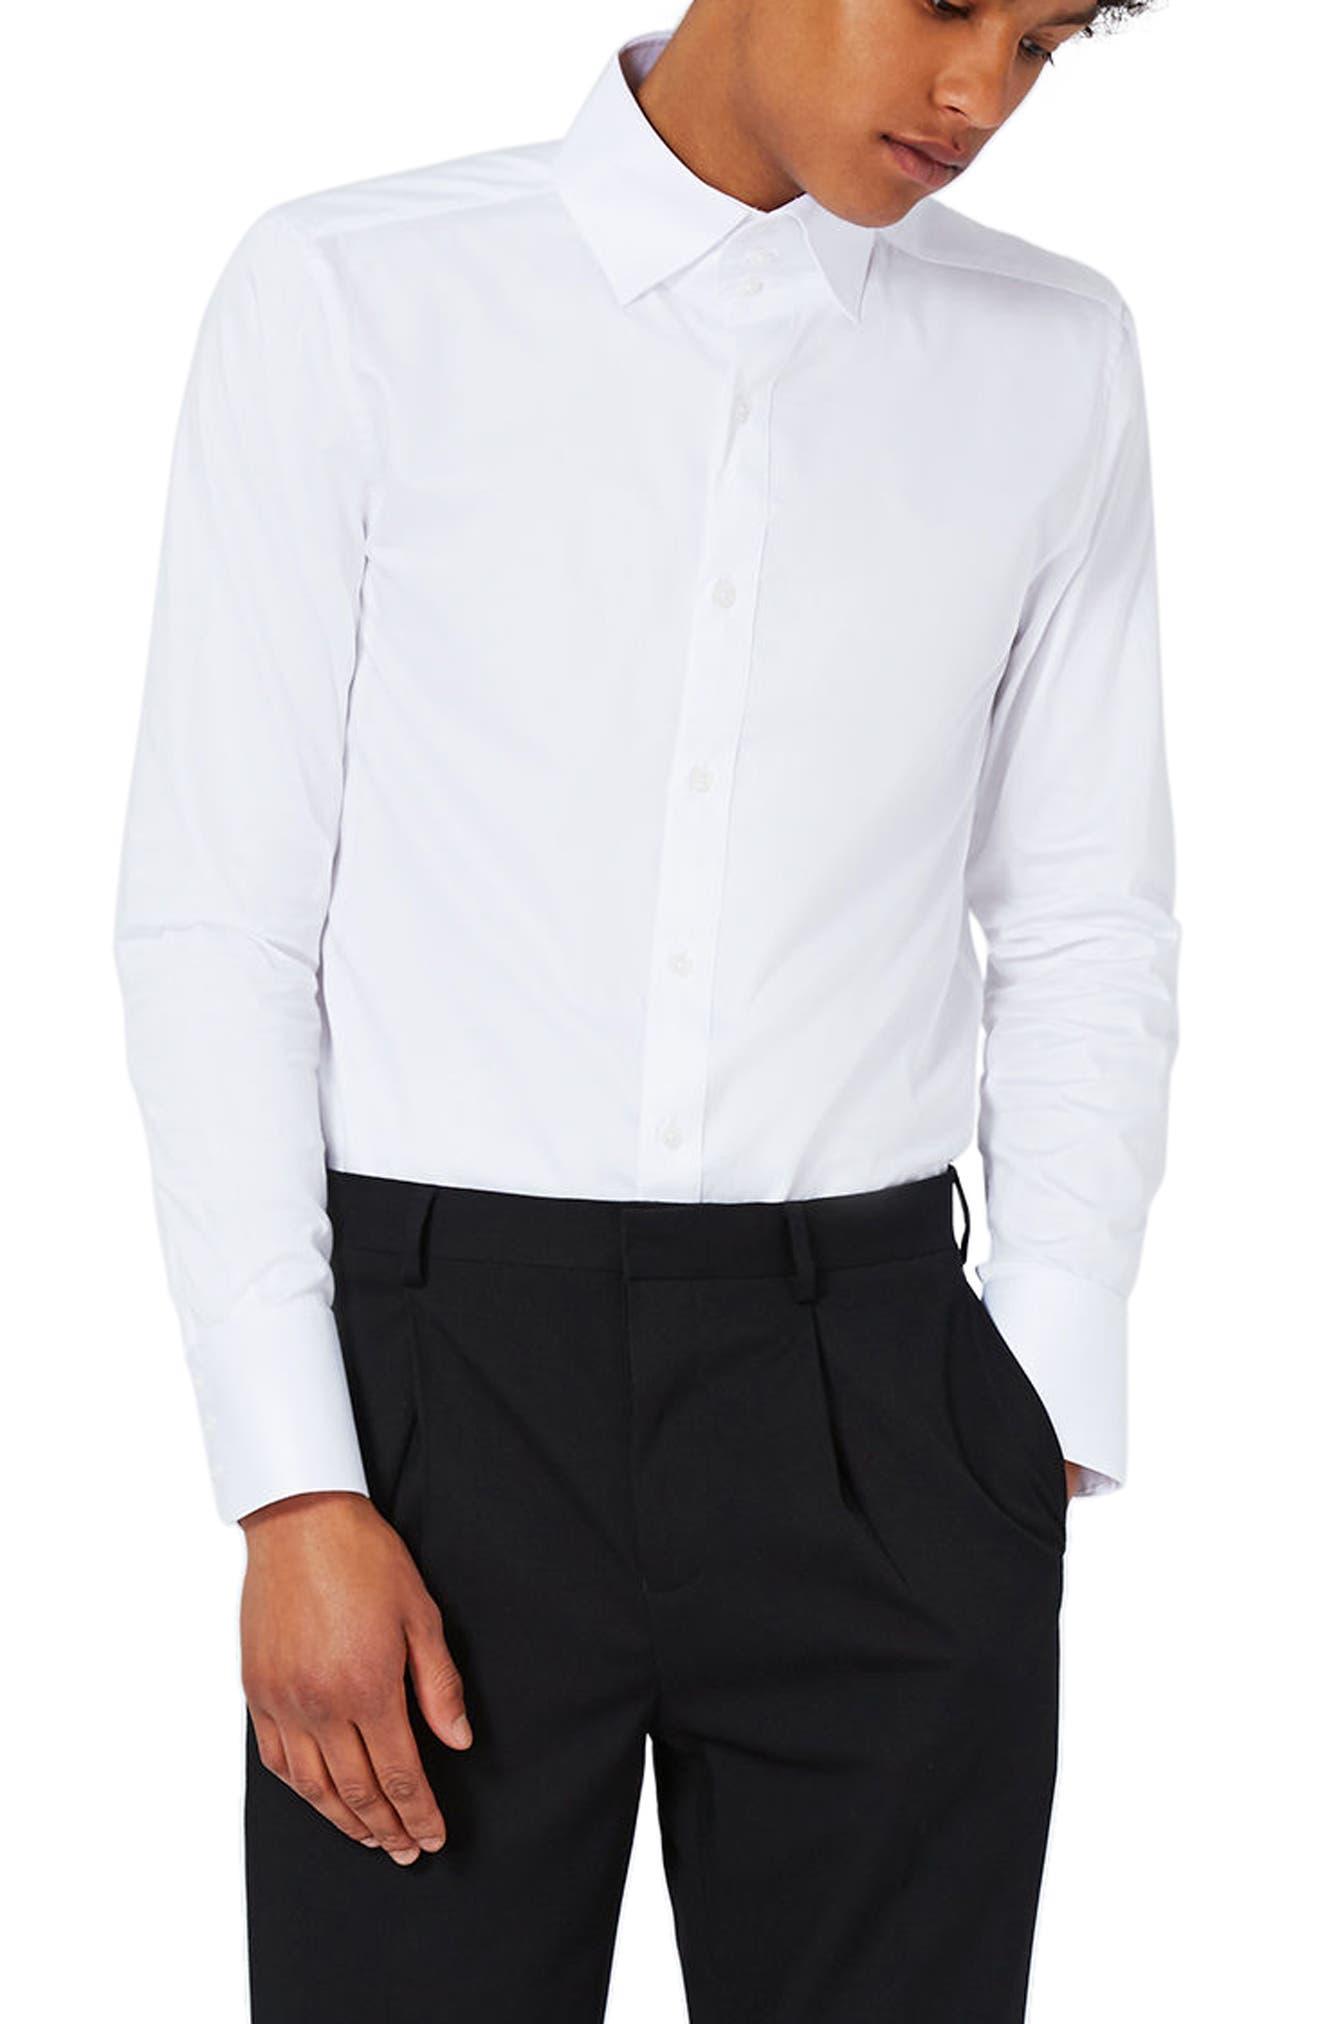 Topman Triple Button Collar Dress Shirt